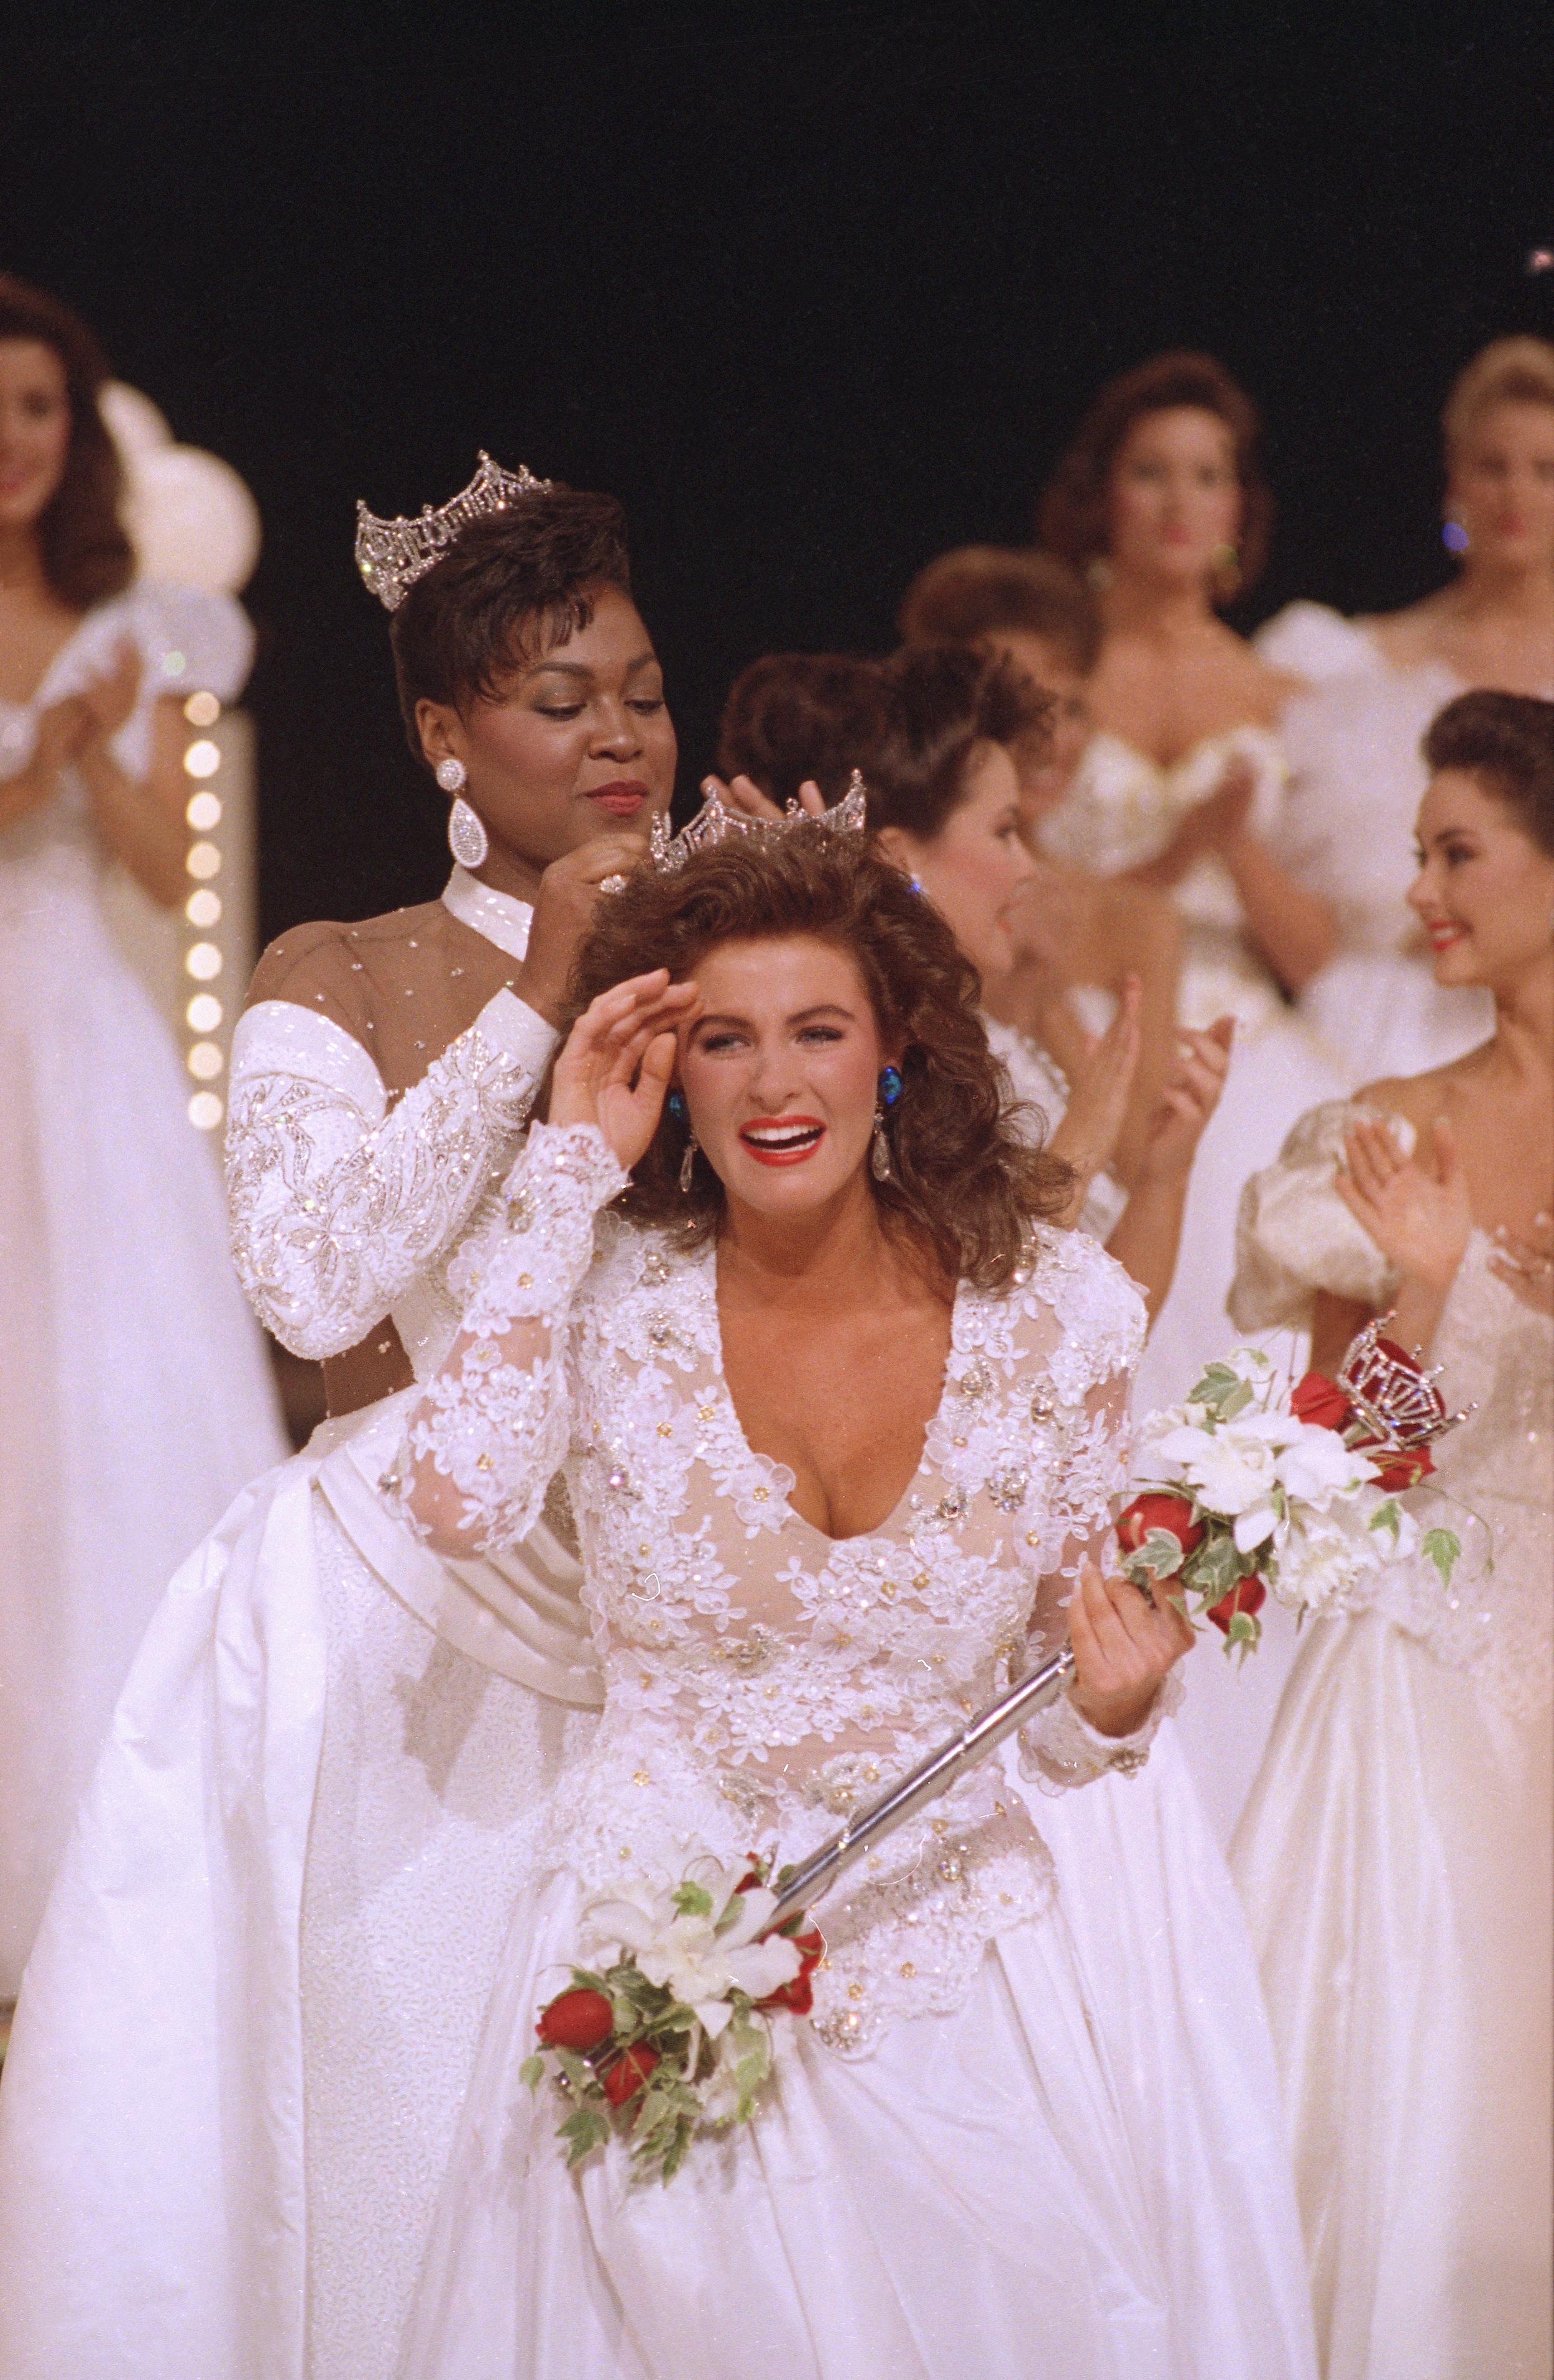 Miss America 1992, Carolyn Sapp of Hawaii, is crowned by former Miss America Marjorie Judith Vincent on Sept. 14, 1991.